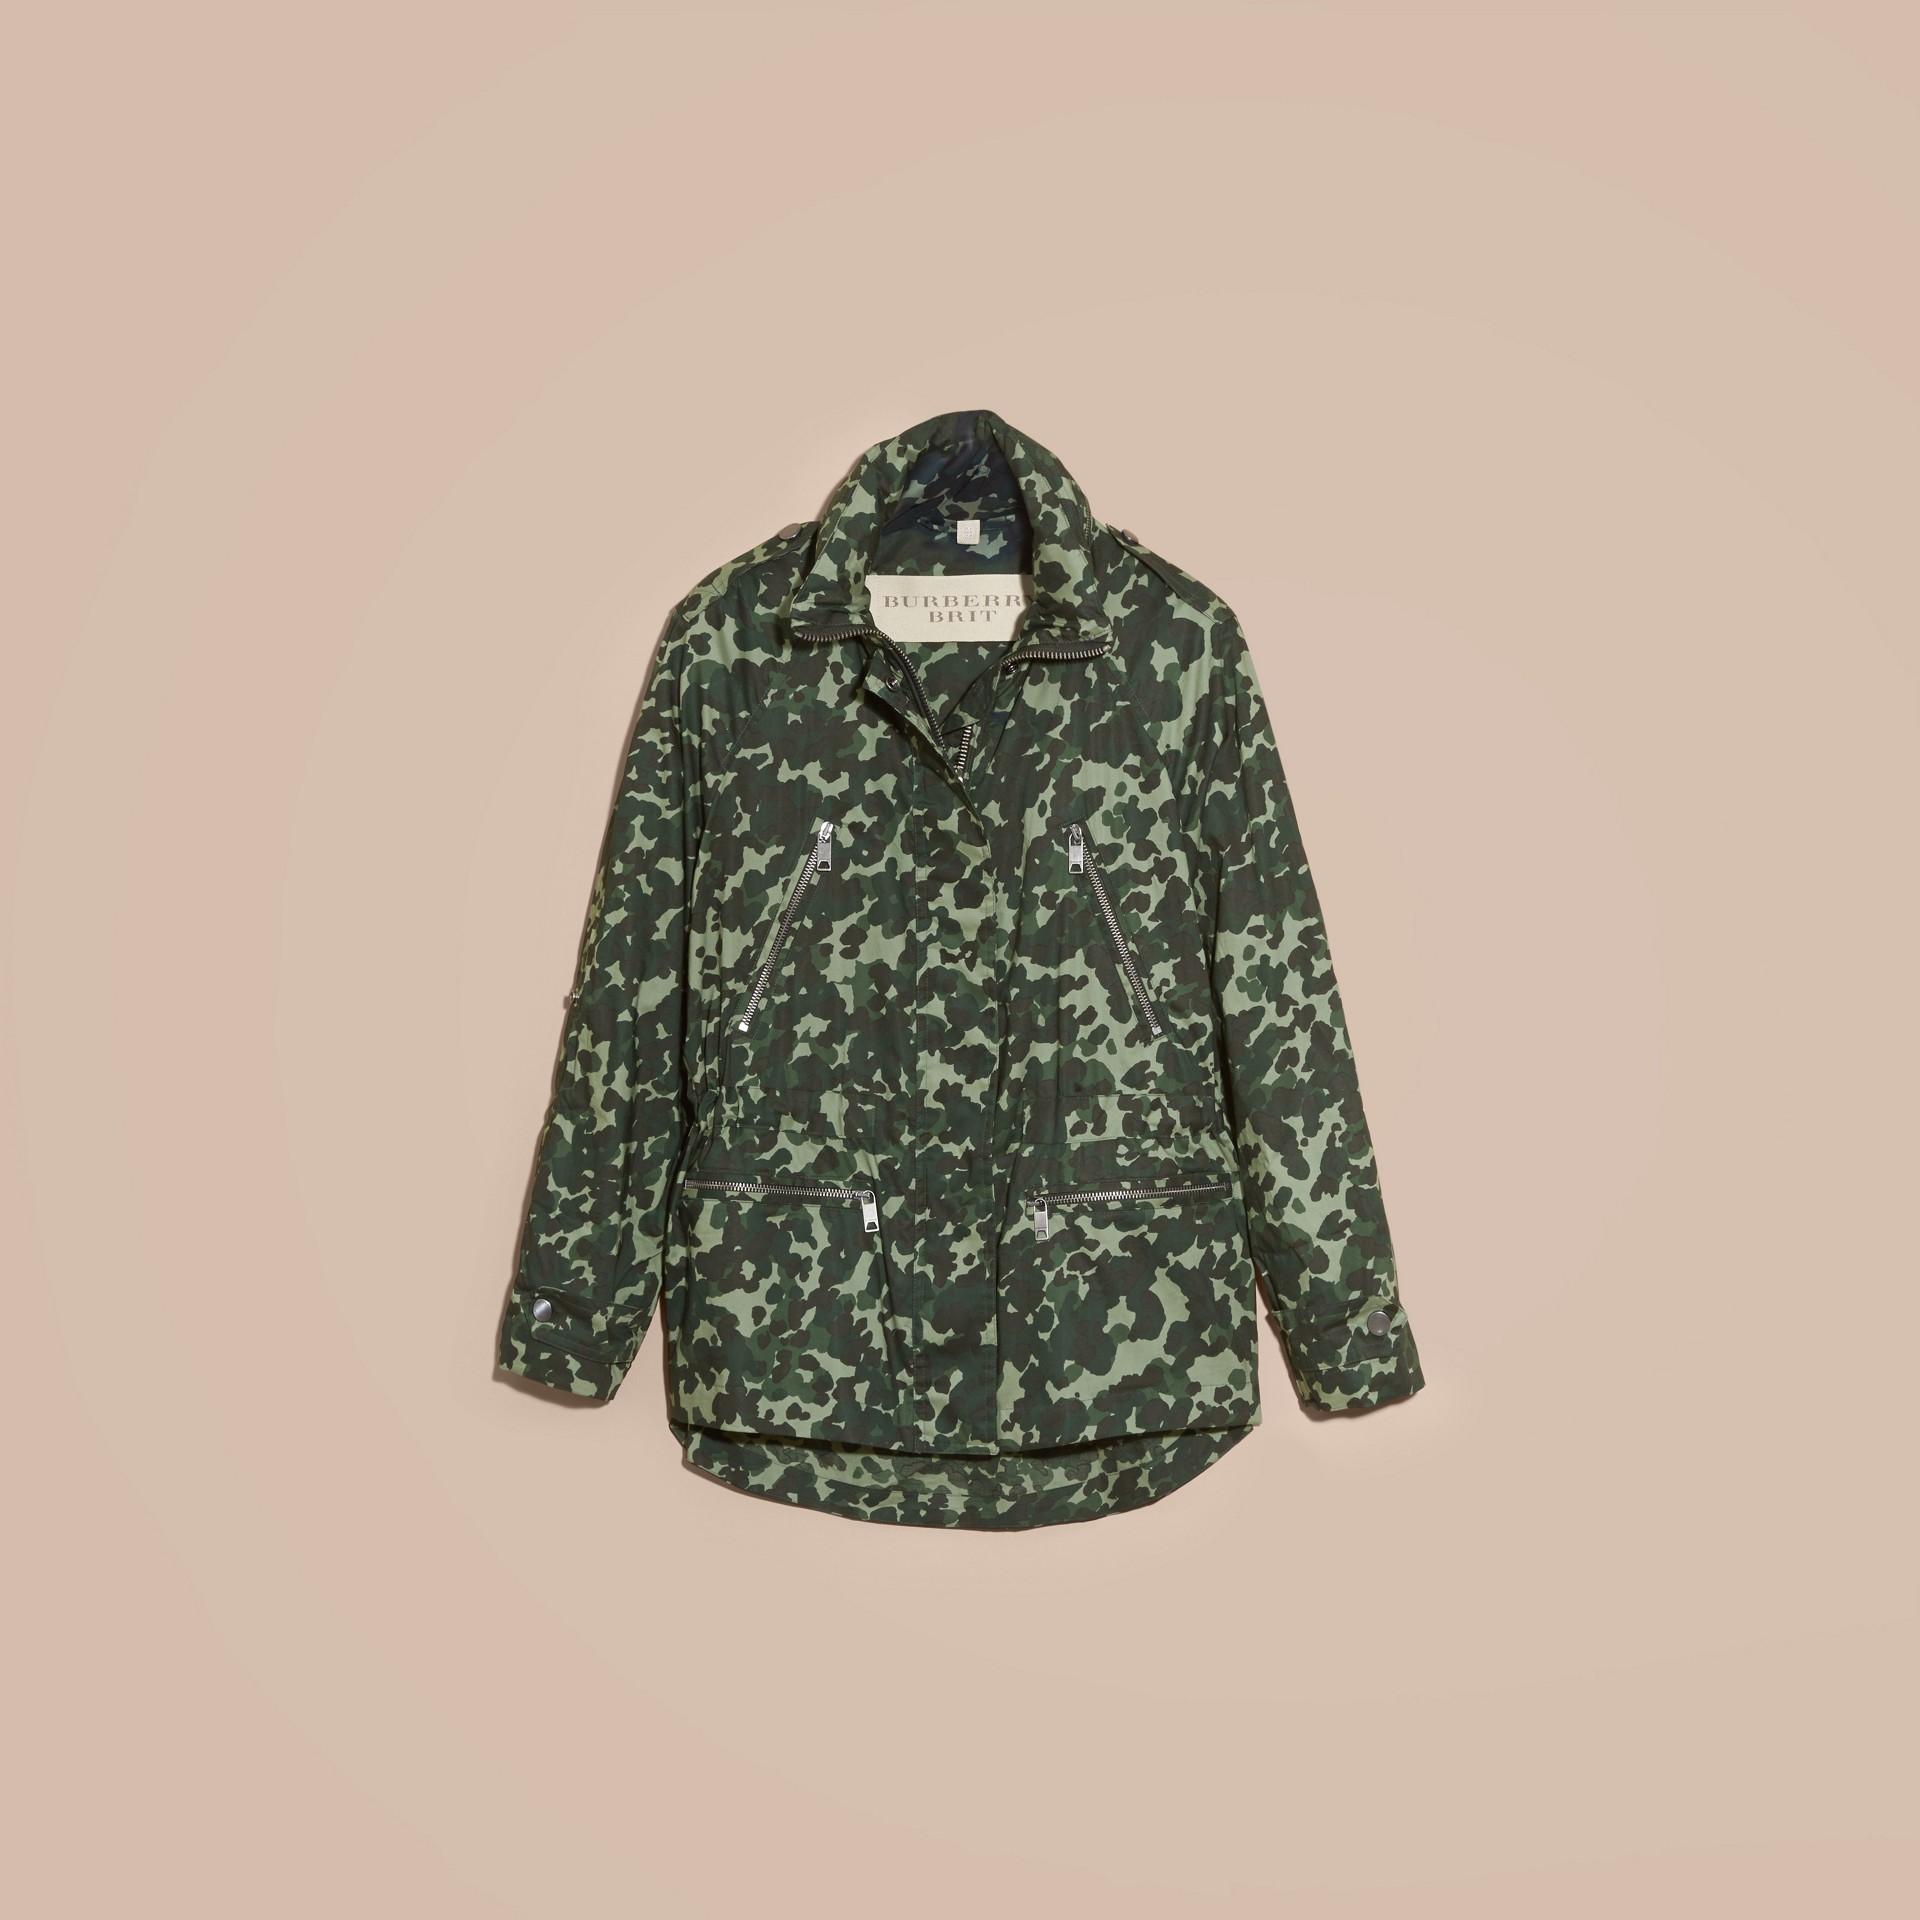 Deep bottle green Showerproof Cotton Parka Jacket with Packaway Hood - gallery image 4